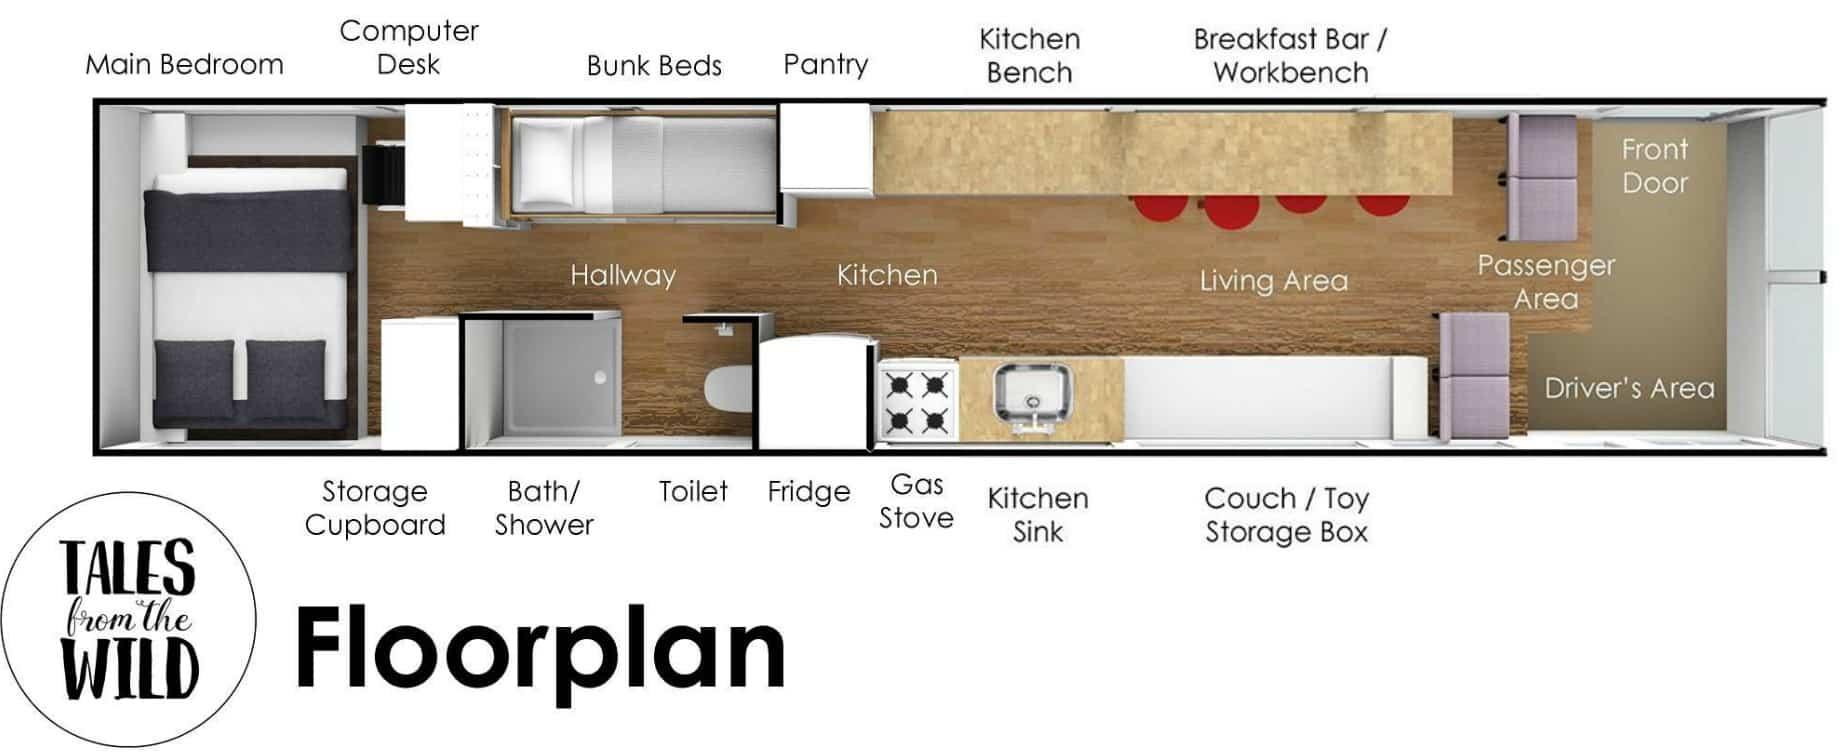 floorplan - Australian family turned 1998 Hino school bus into a delightful home on wheels